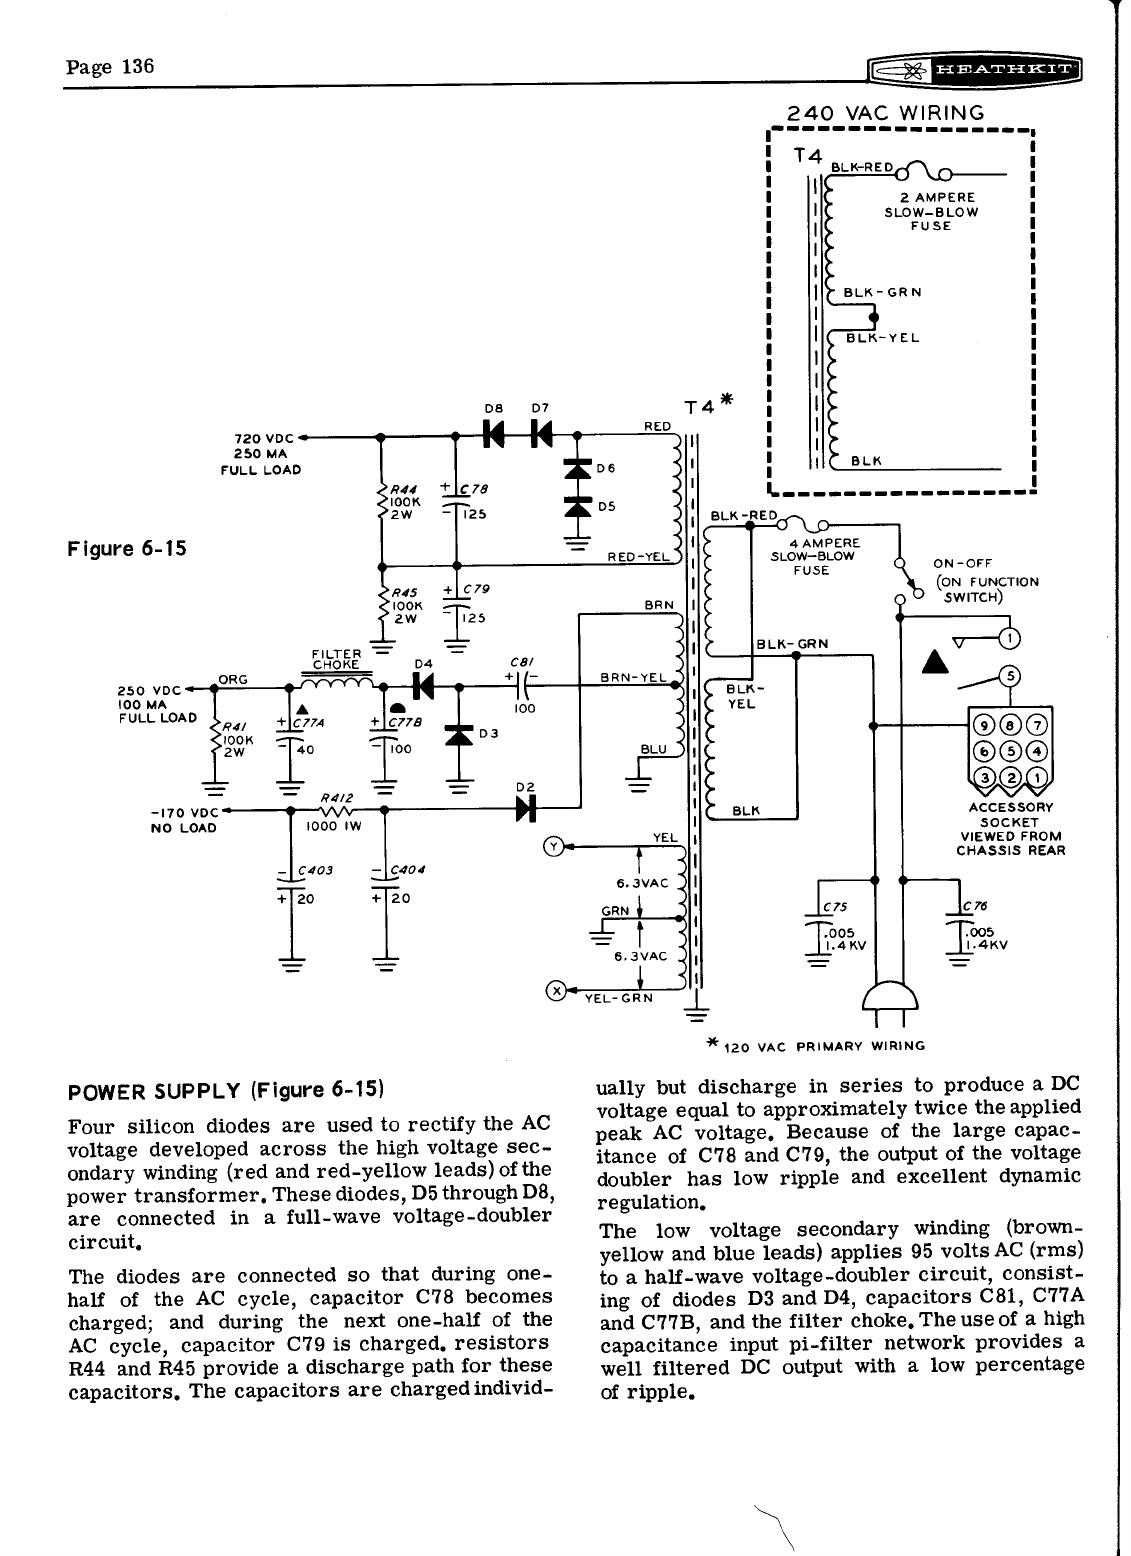 Sb401 250vdc Wiring Diagram 50543